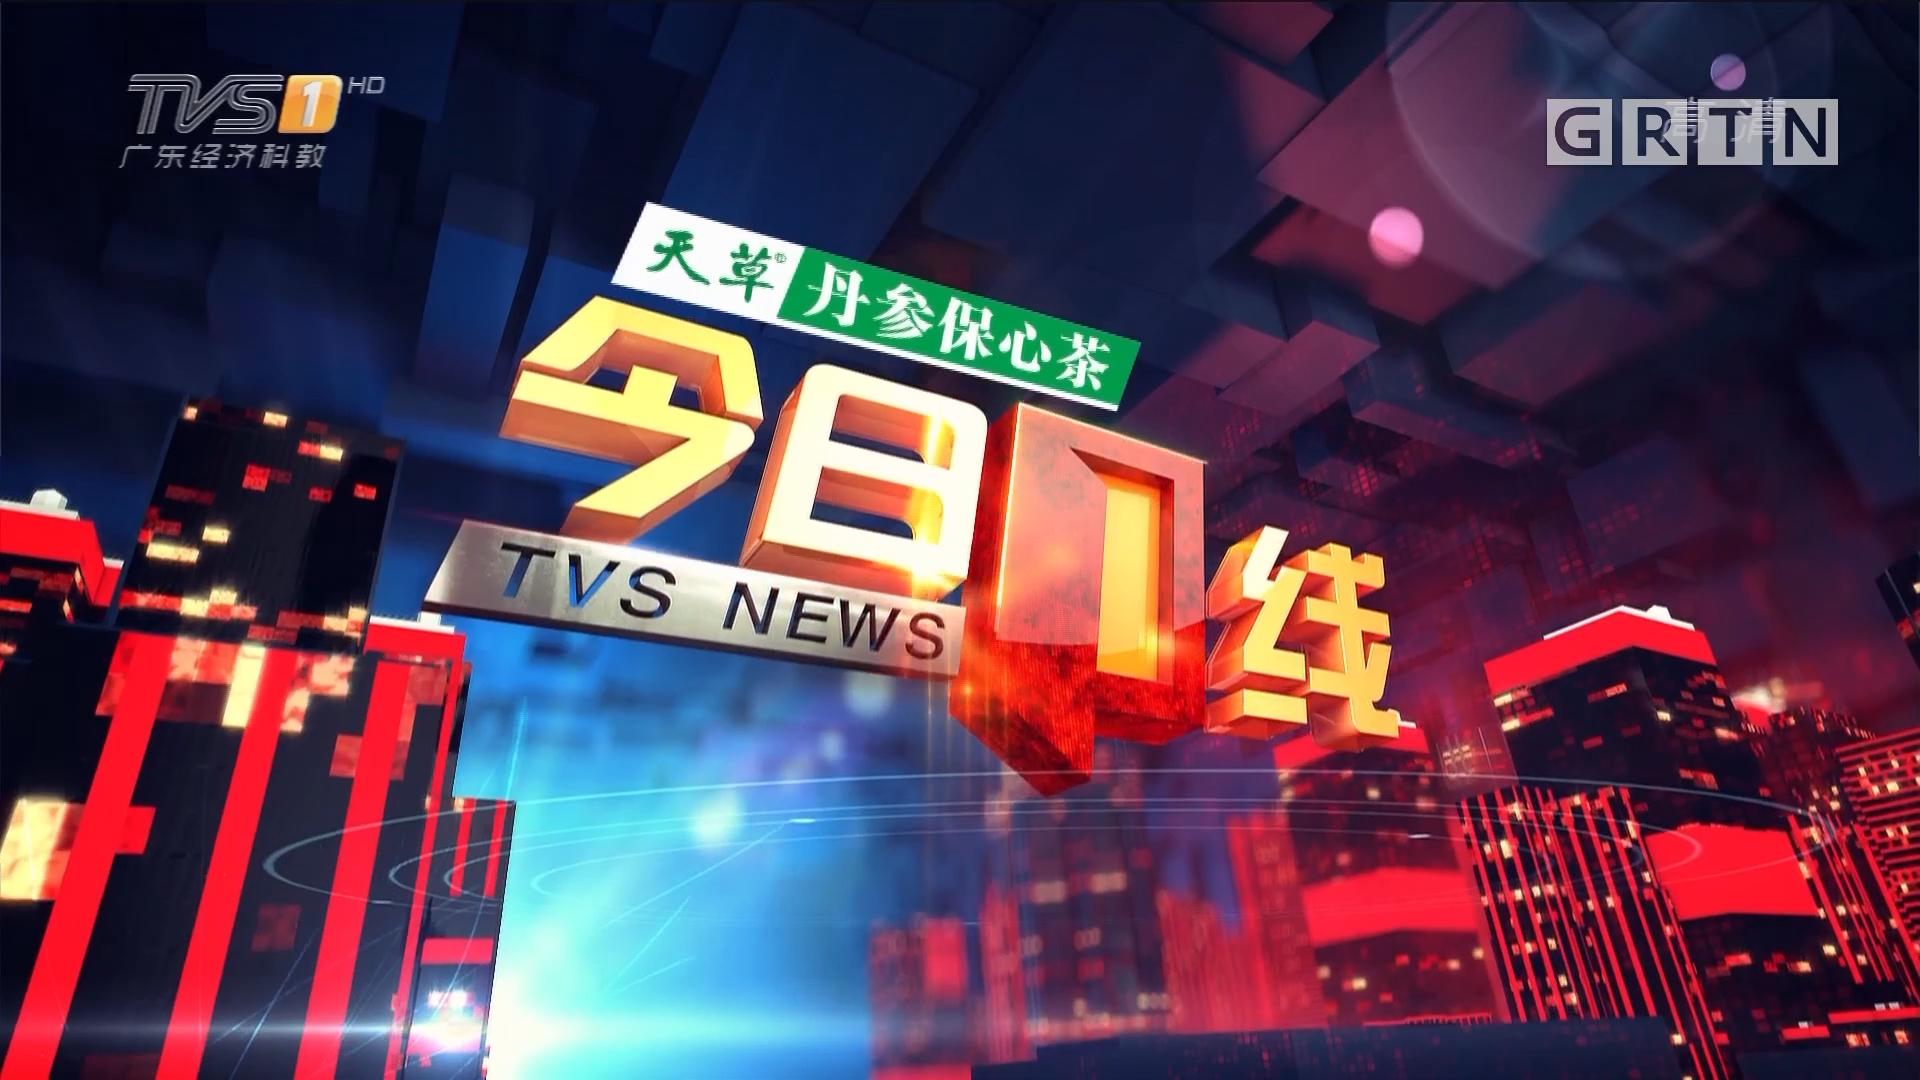 [HD][2017-09-13]今日一线:广州黄埔刘村社区:村干部受贿144万 6人获刑